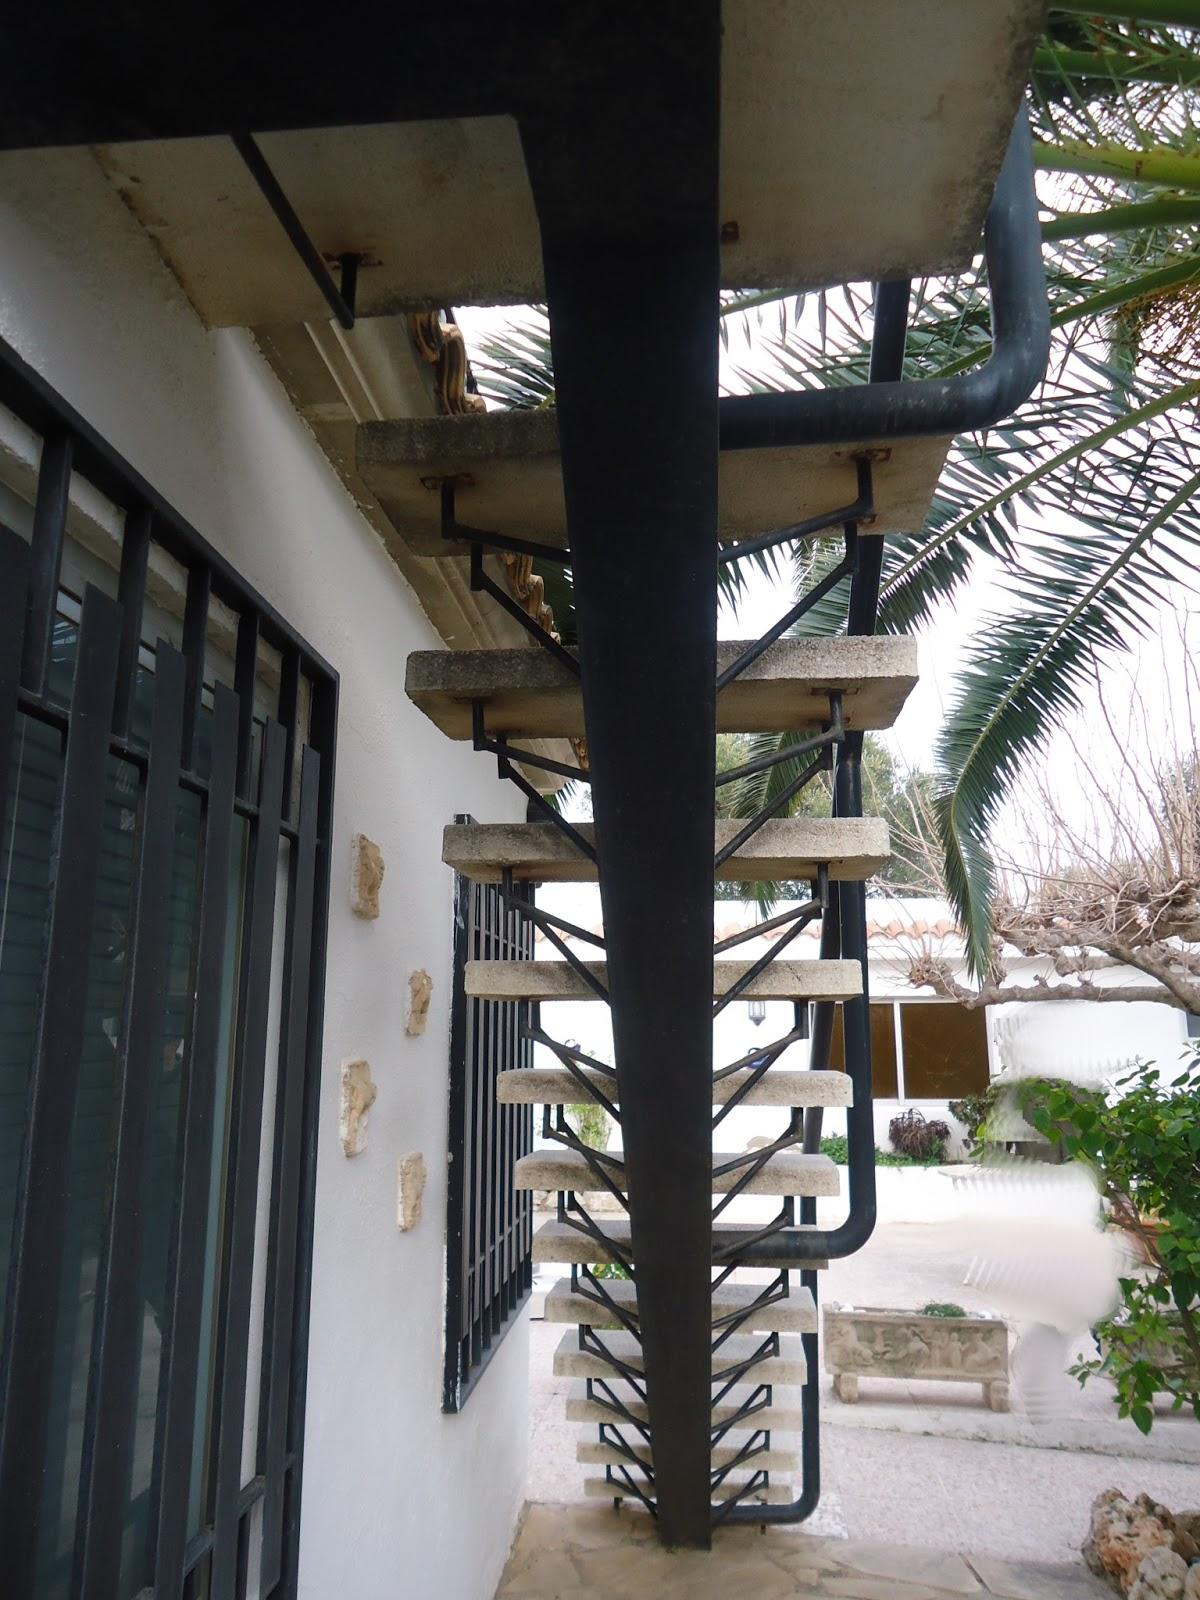 Se podr a decir que esta estructura trabaja con cargas de for Escalera de bloque de jardin